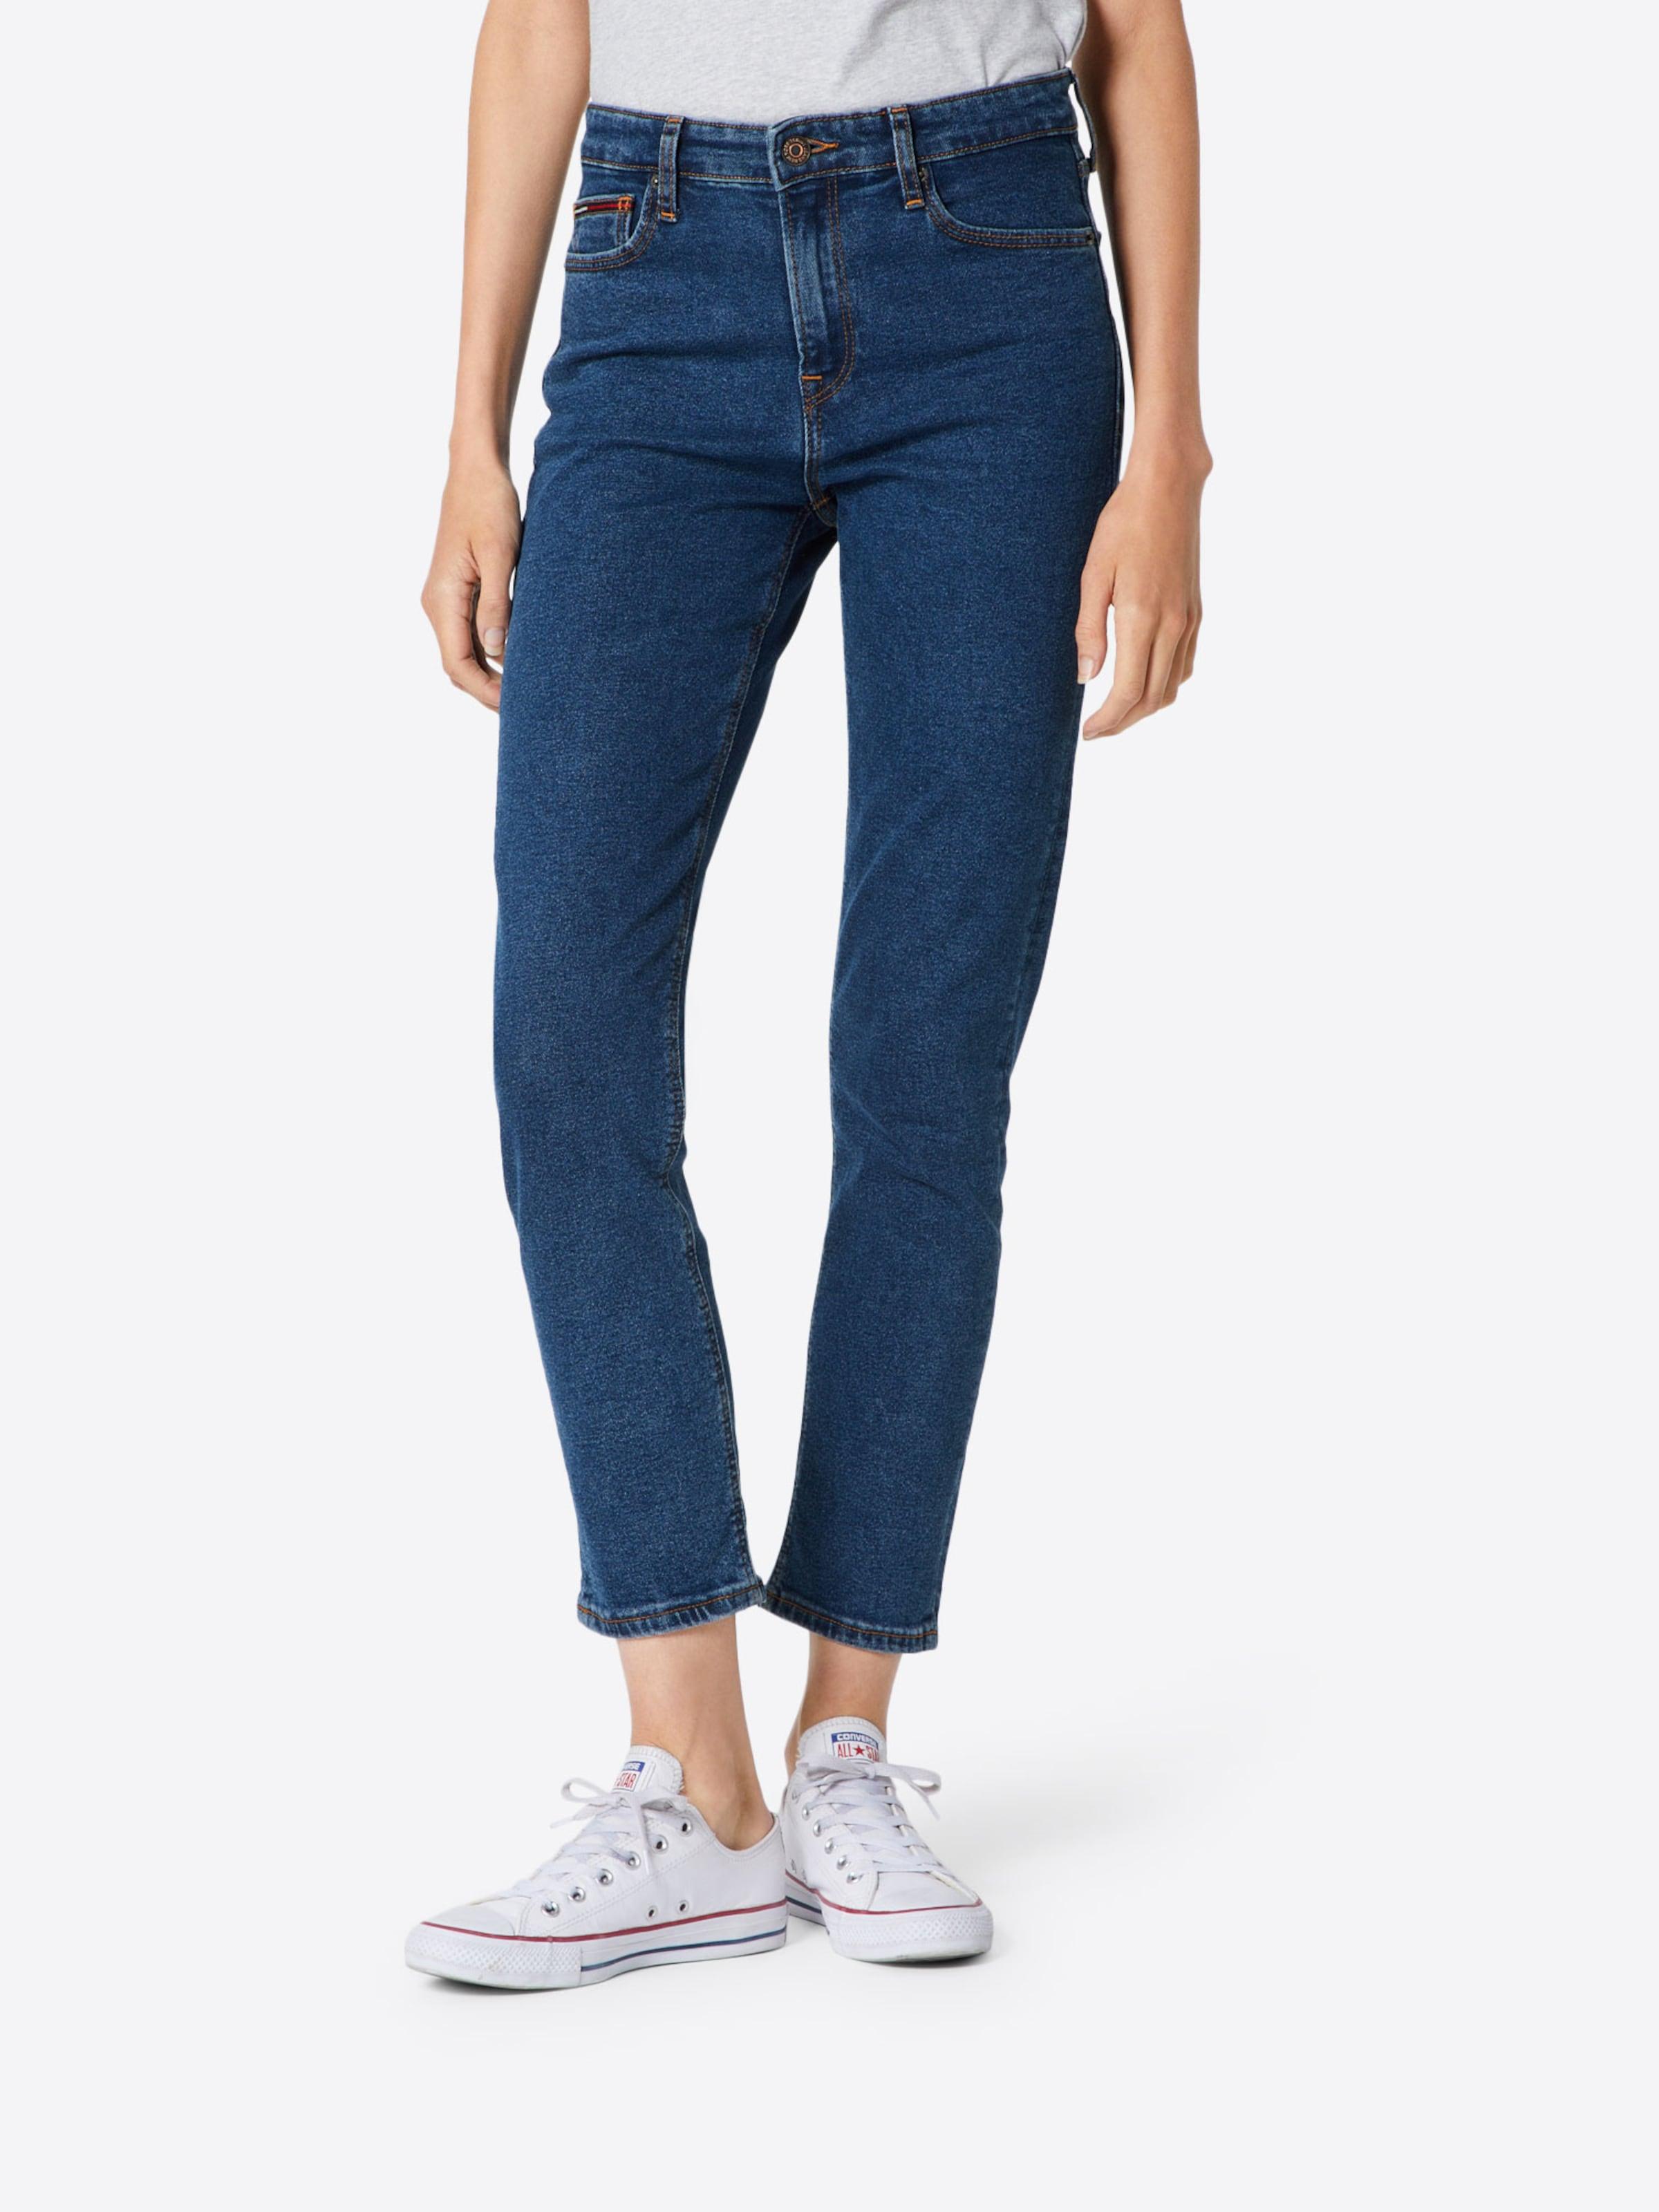 Tommy Blue Tommy Tommy Jeans Blue Denim Blue Jeans In In Jeans Denim In YIfvm6by7g